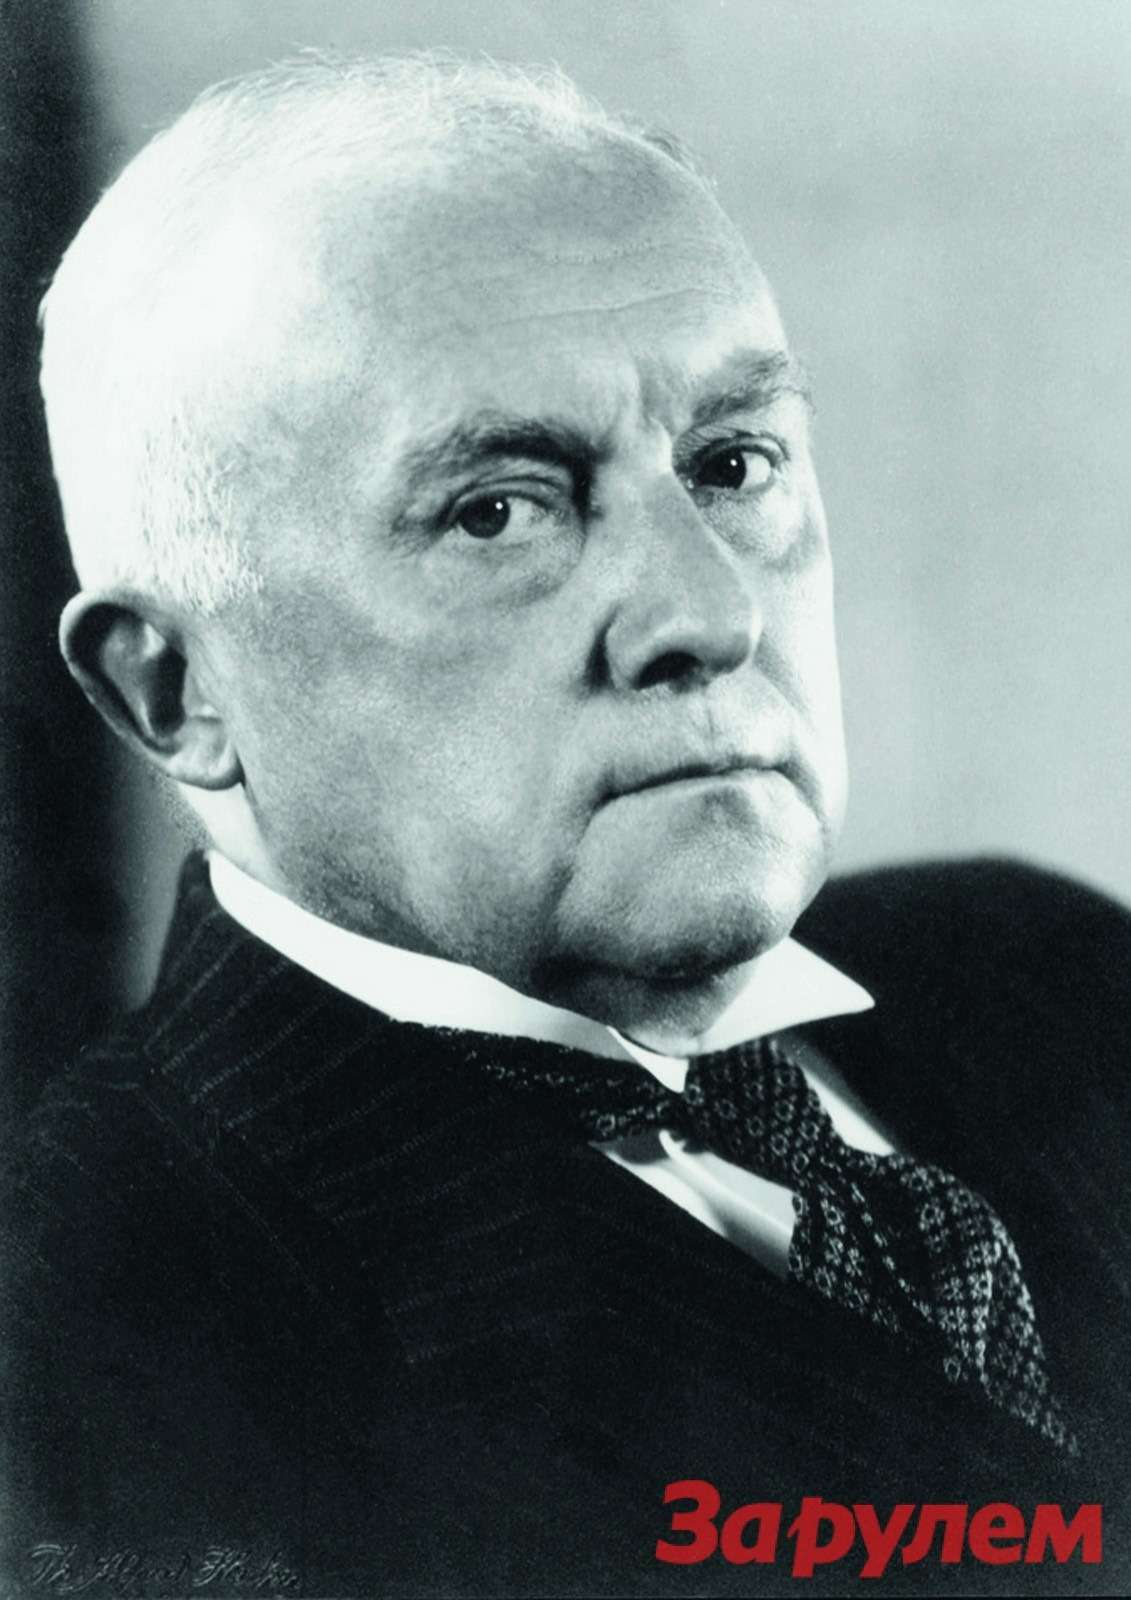 Йорген Скафте Расмуссен (1878 - 1964 гг.)